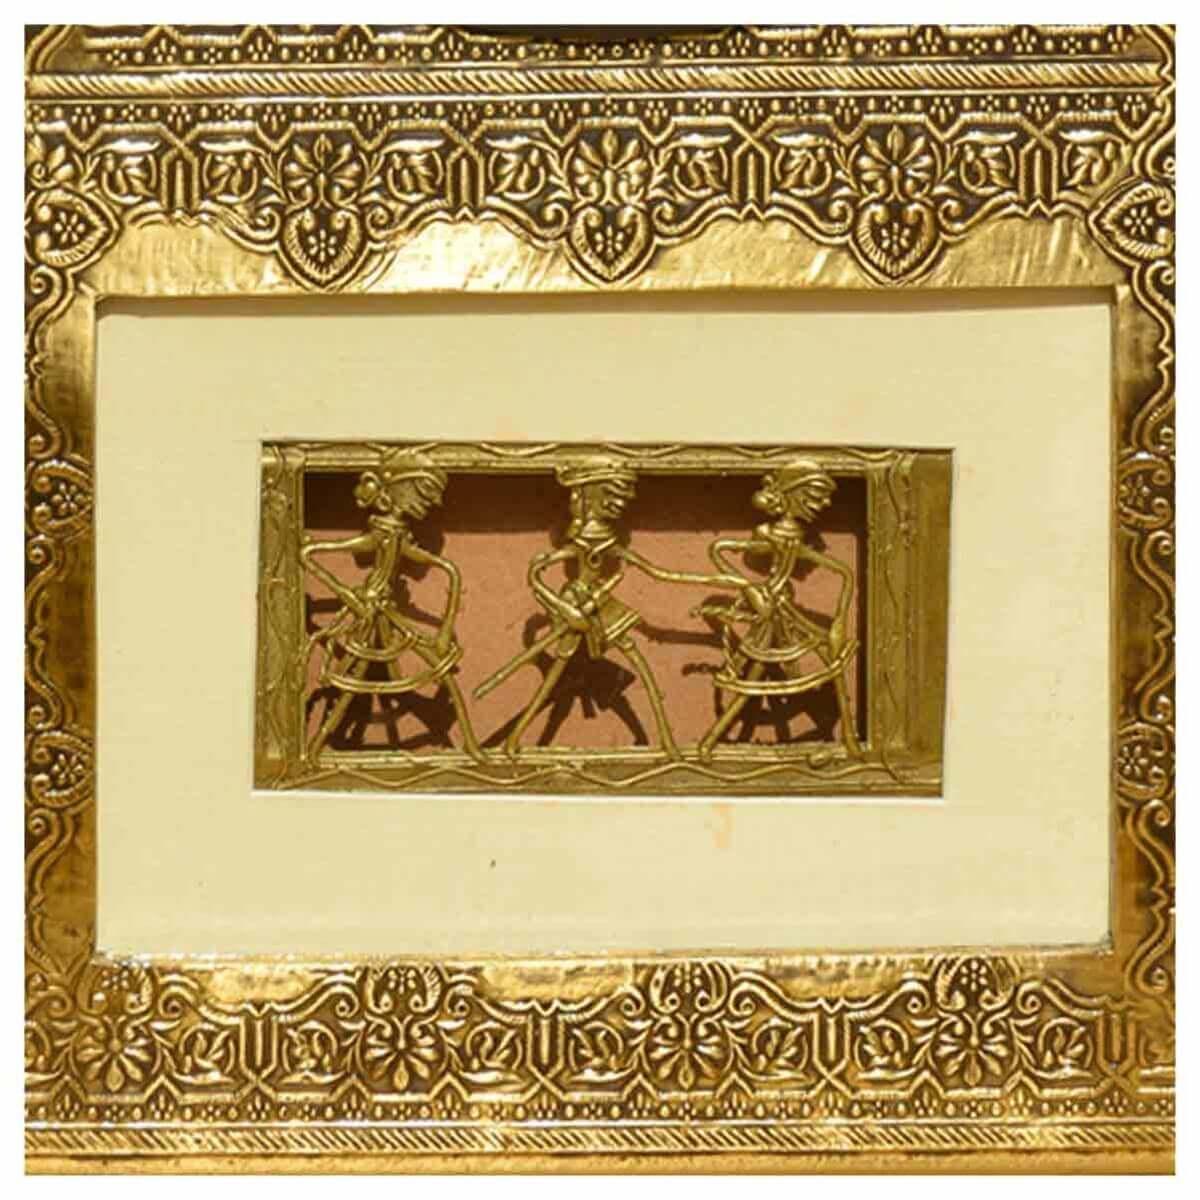 3 Dancers Brass & Mango Wood Framed Roman Numeral Wall Clock